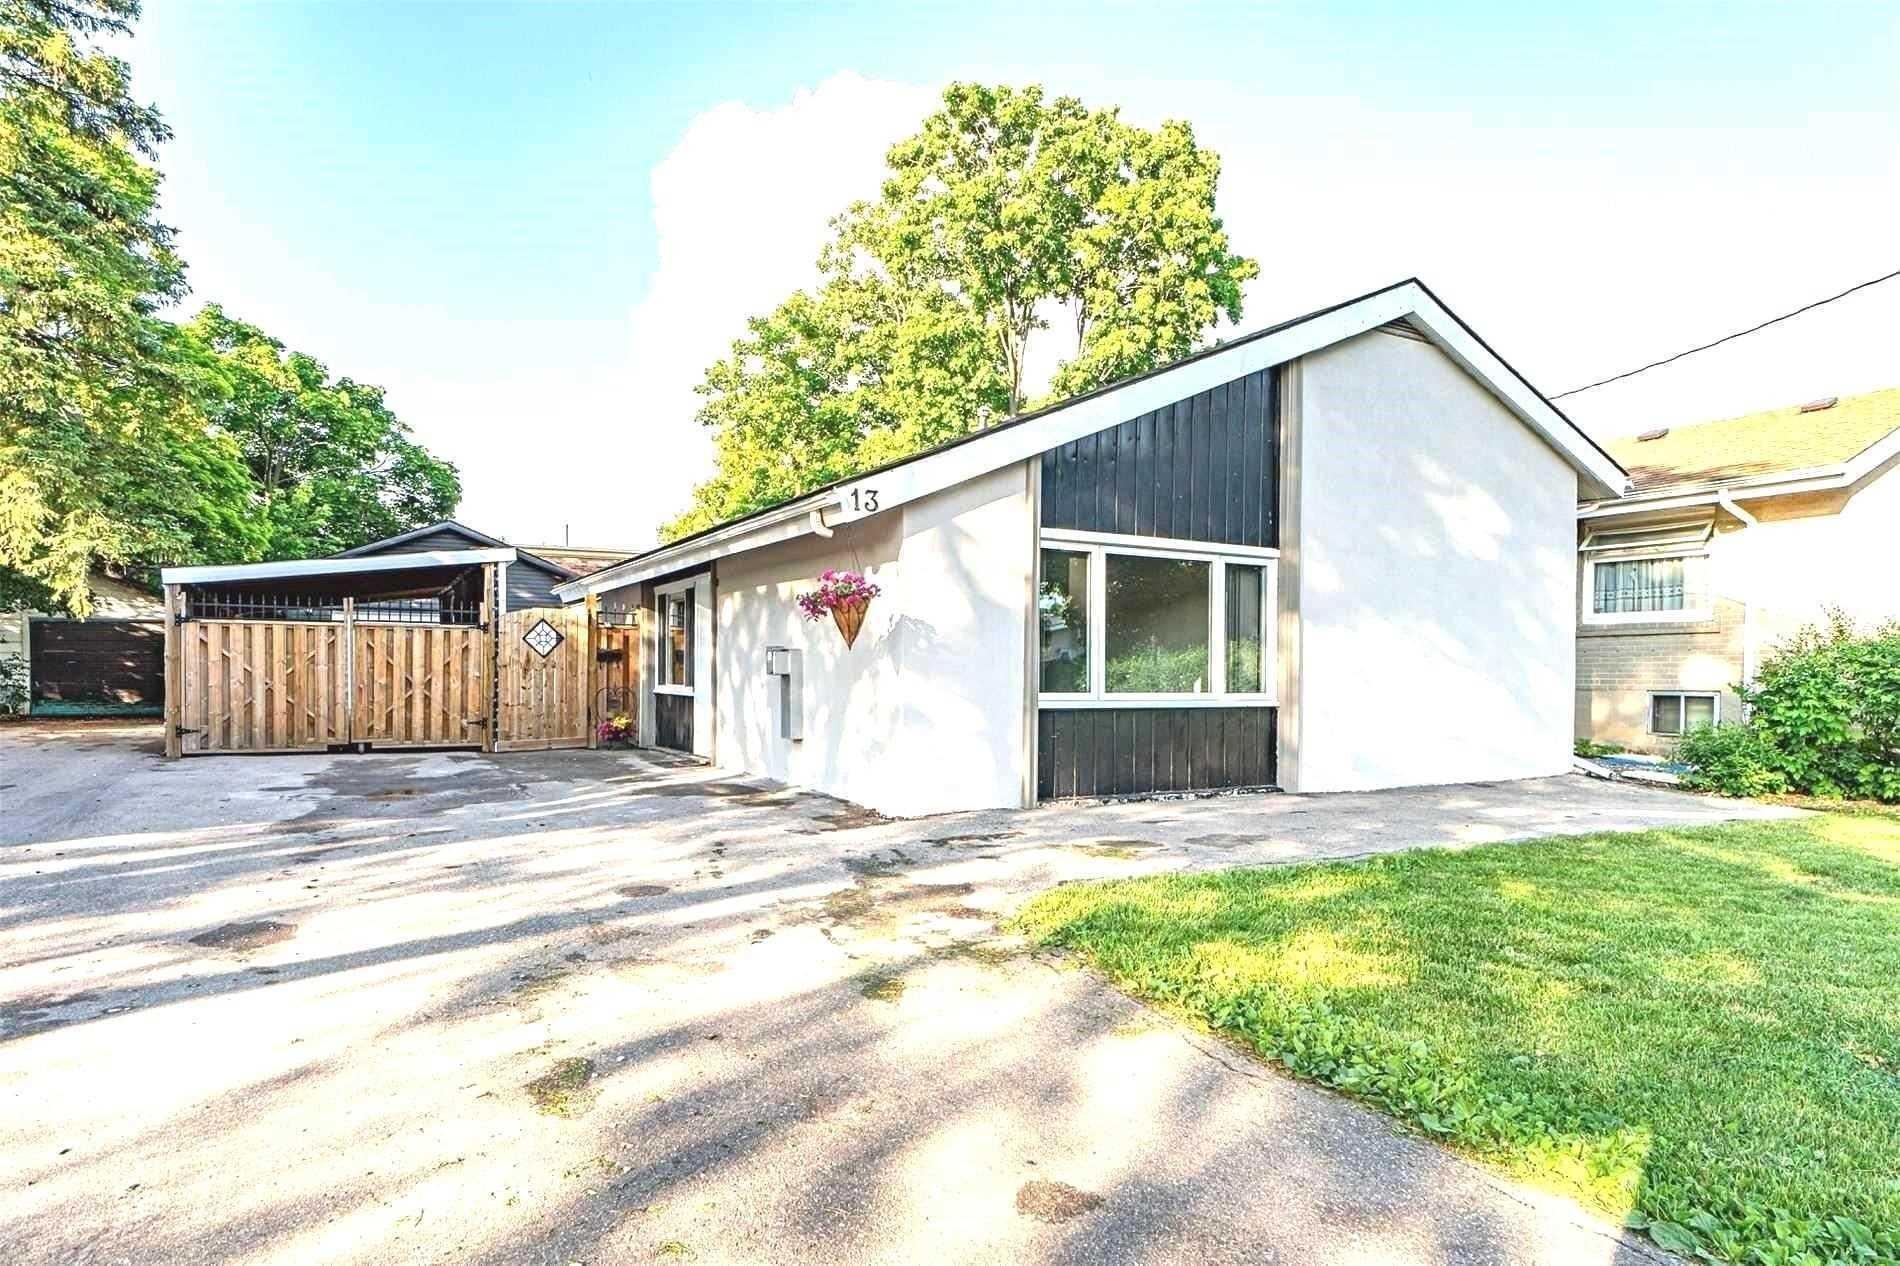 13 Cornwall Rd, Brampton, Ontario L6W1M8, 3 Bedrooms Bedrooms, ,2 BathroomsBathrooms,Detached,For Sale,Cornwall,W5145482